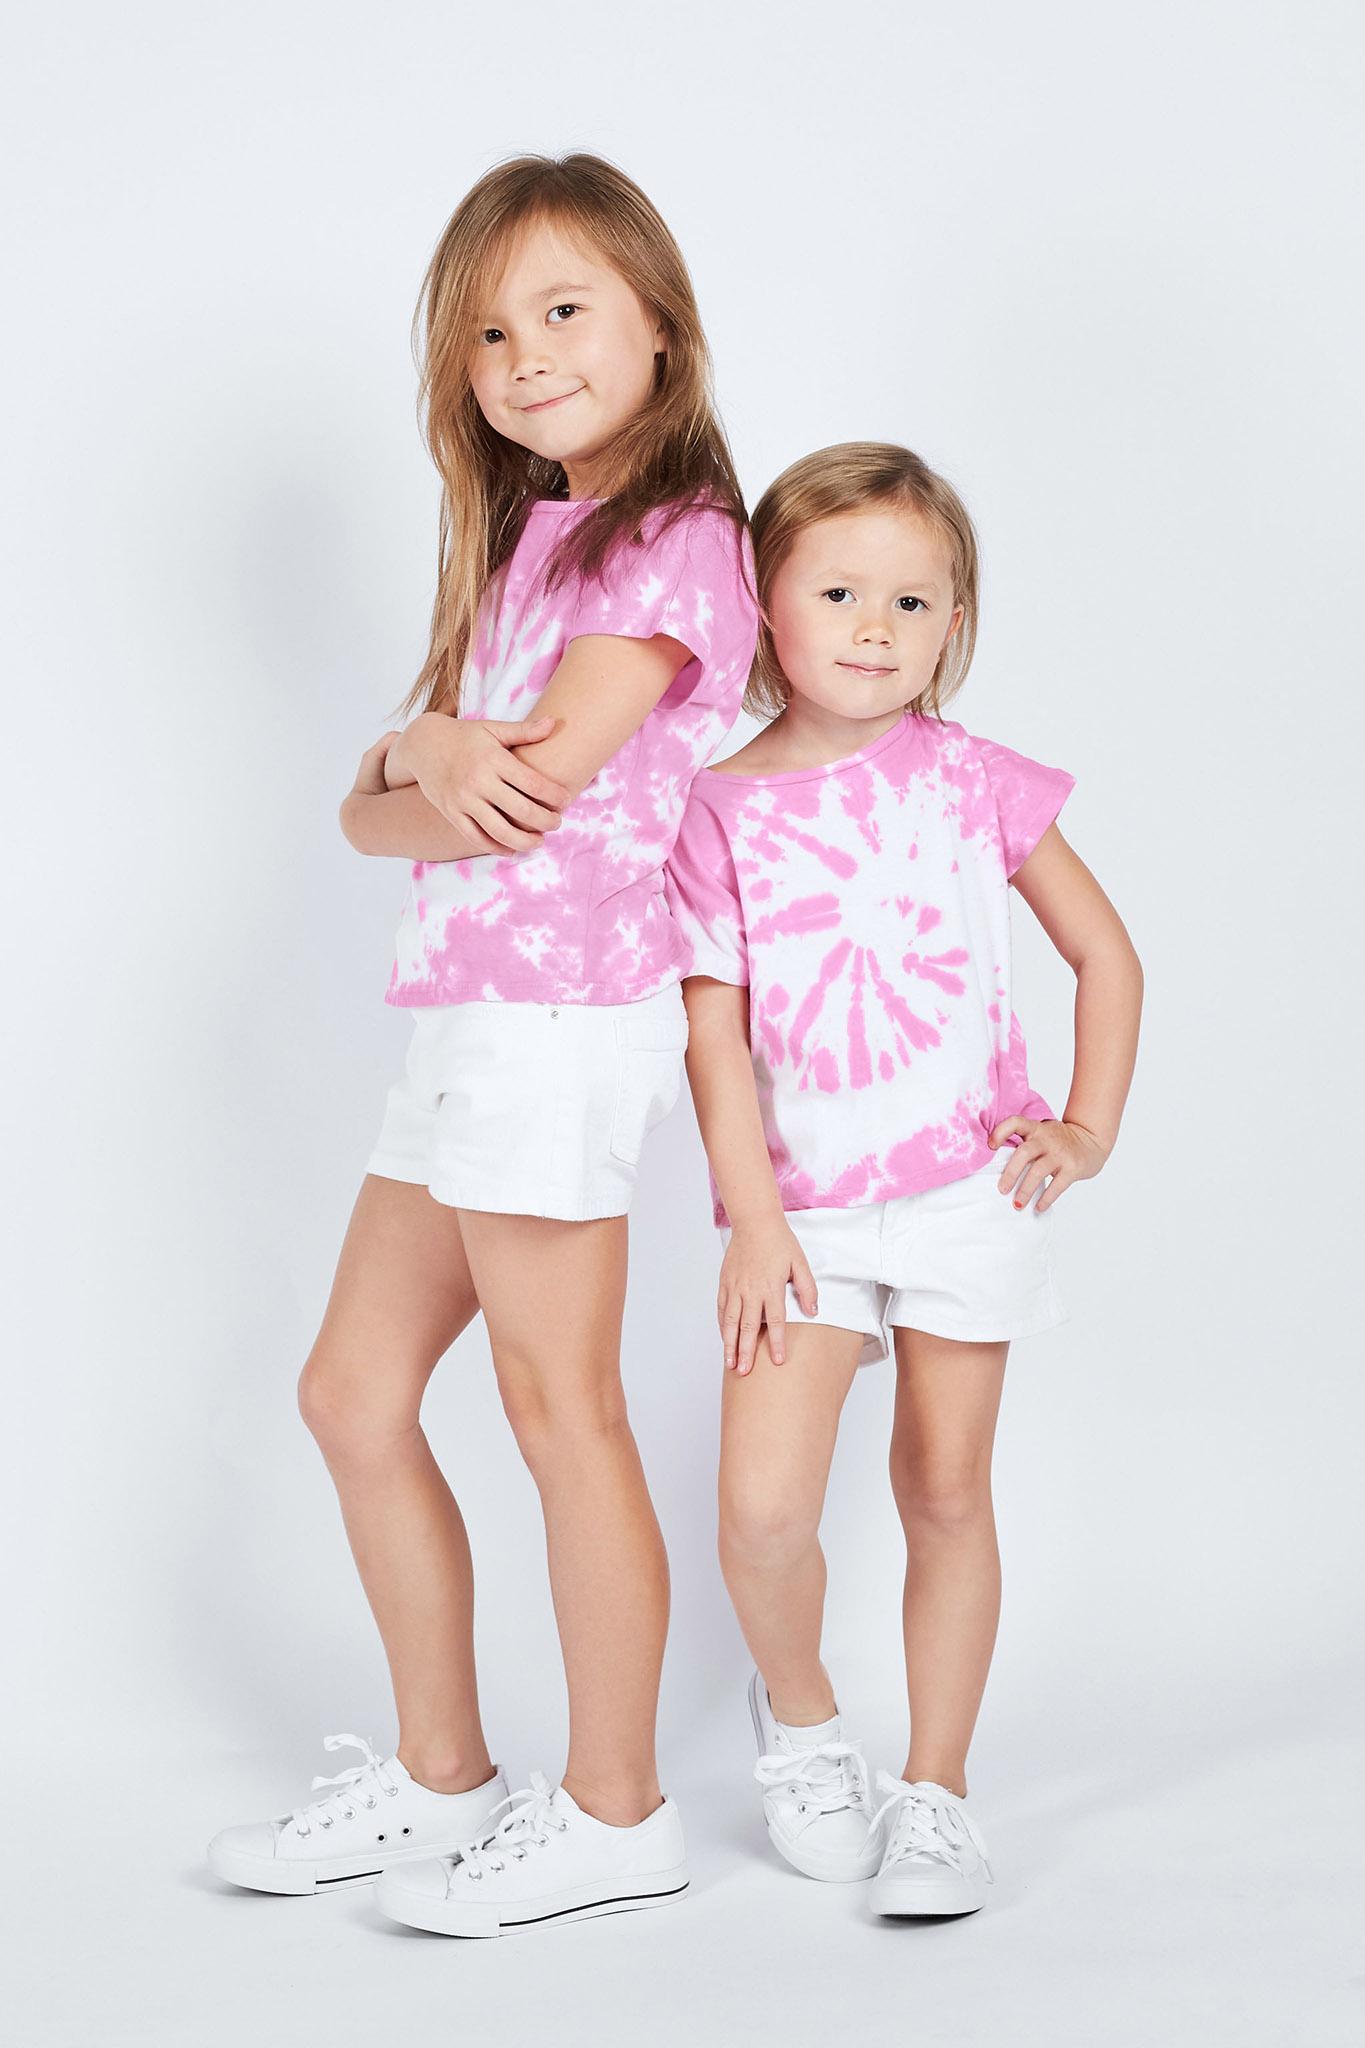 kids-studio-photography-the-jersey-shop-5